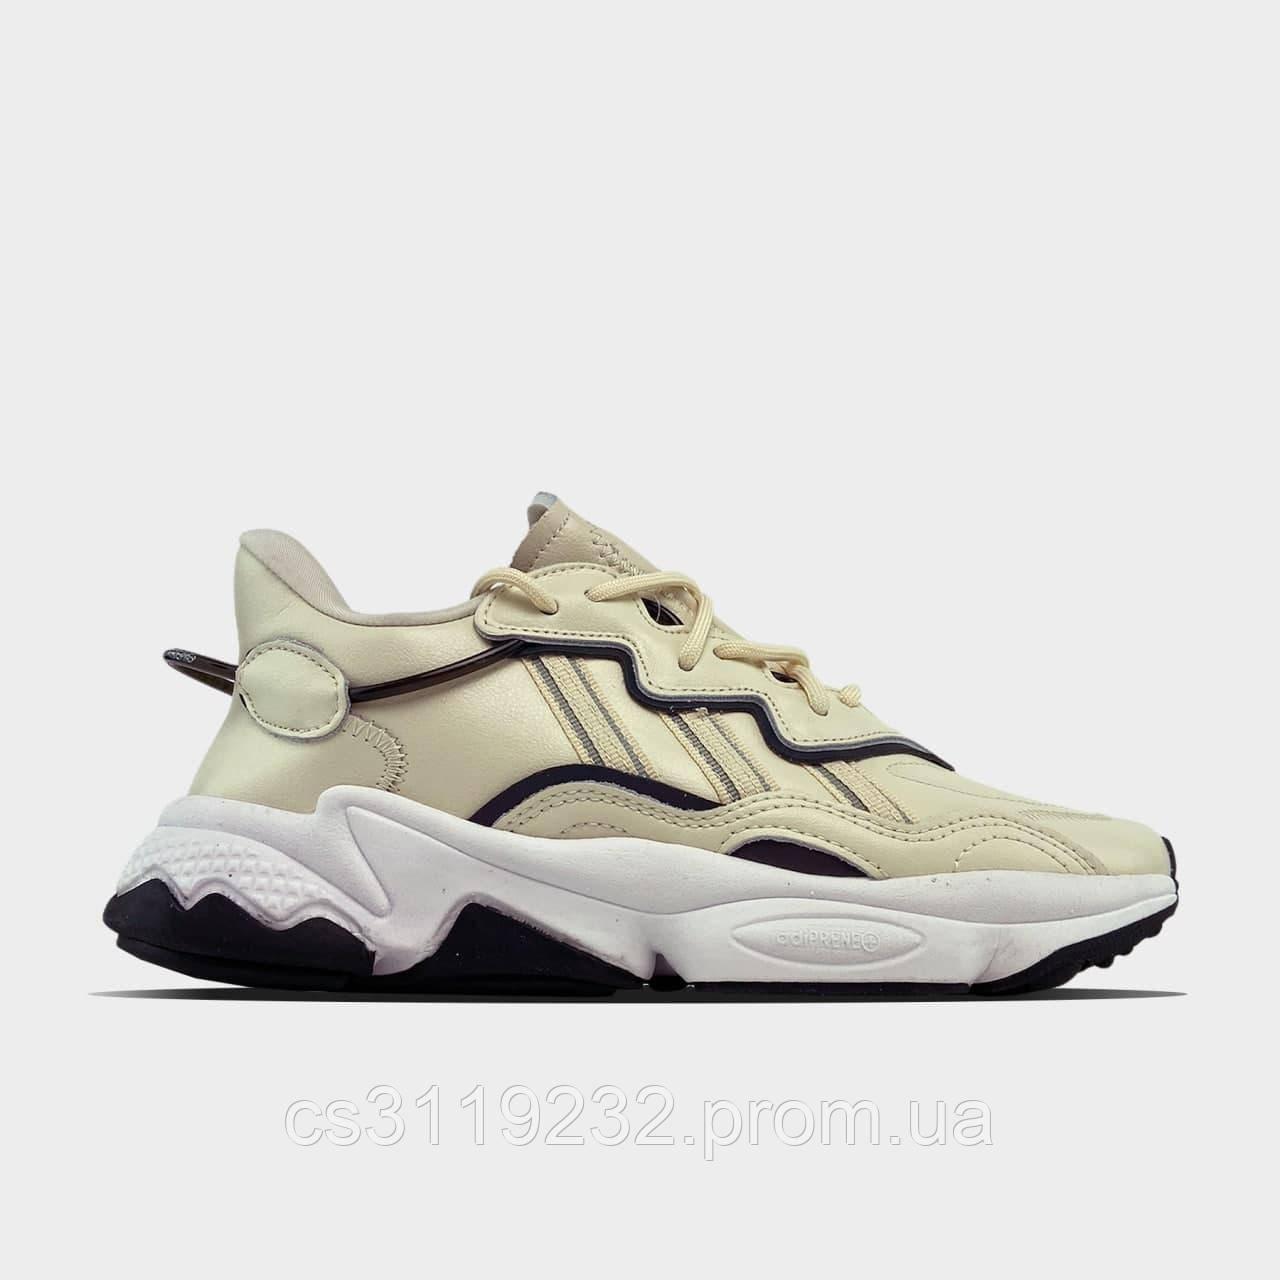 Женские кроссовки Adidas Ozweego Beige White (бежевые)